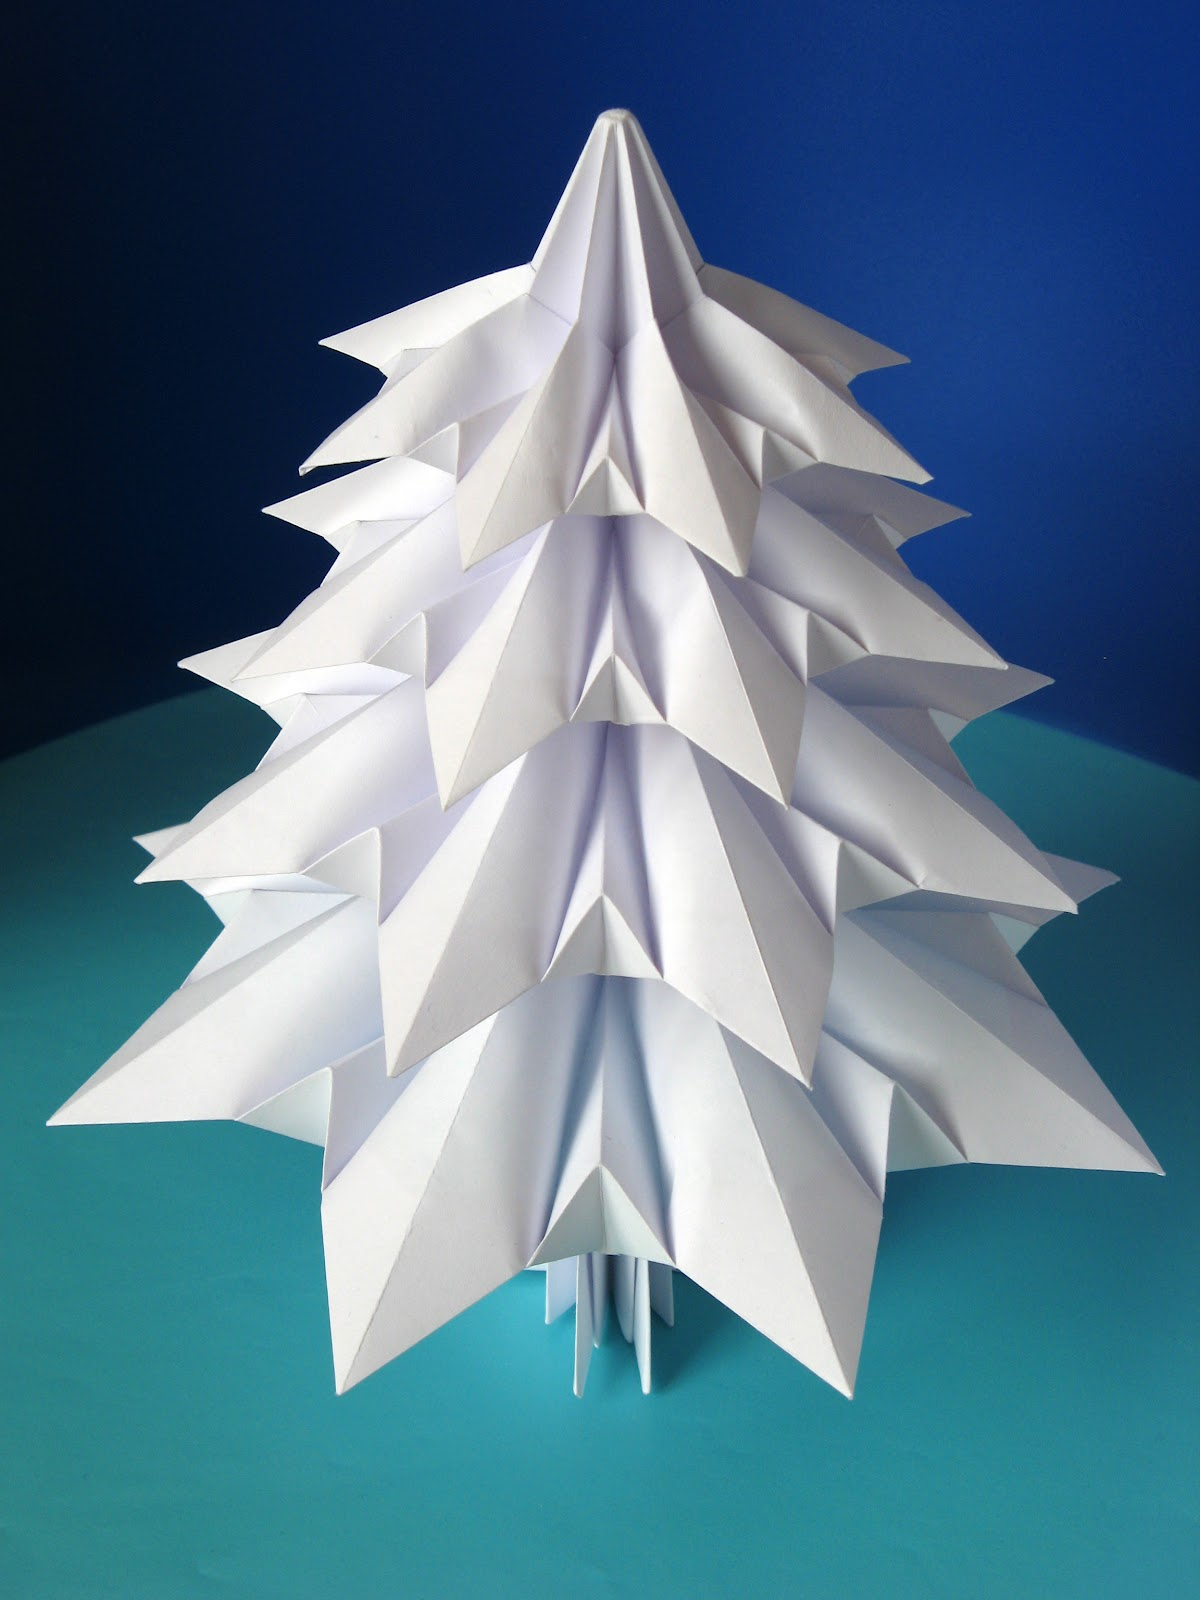 Origami: Abete 3 - Fir tree 3